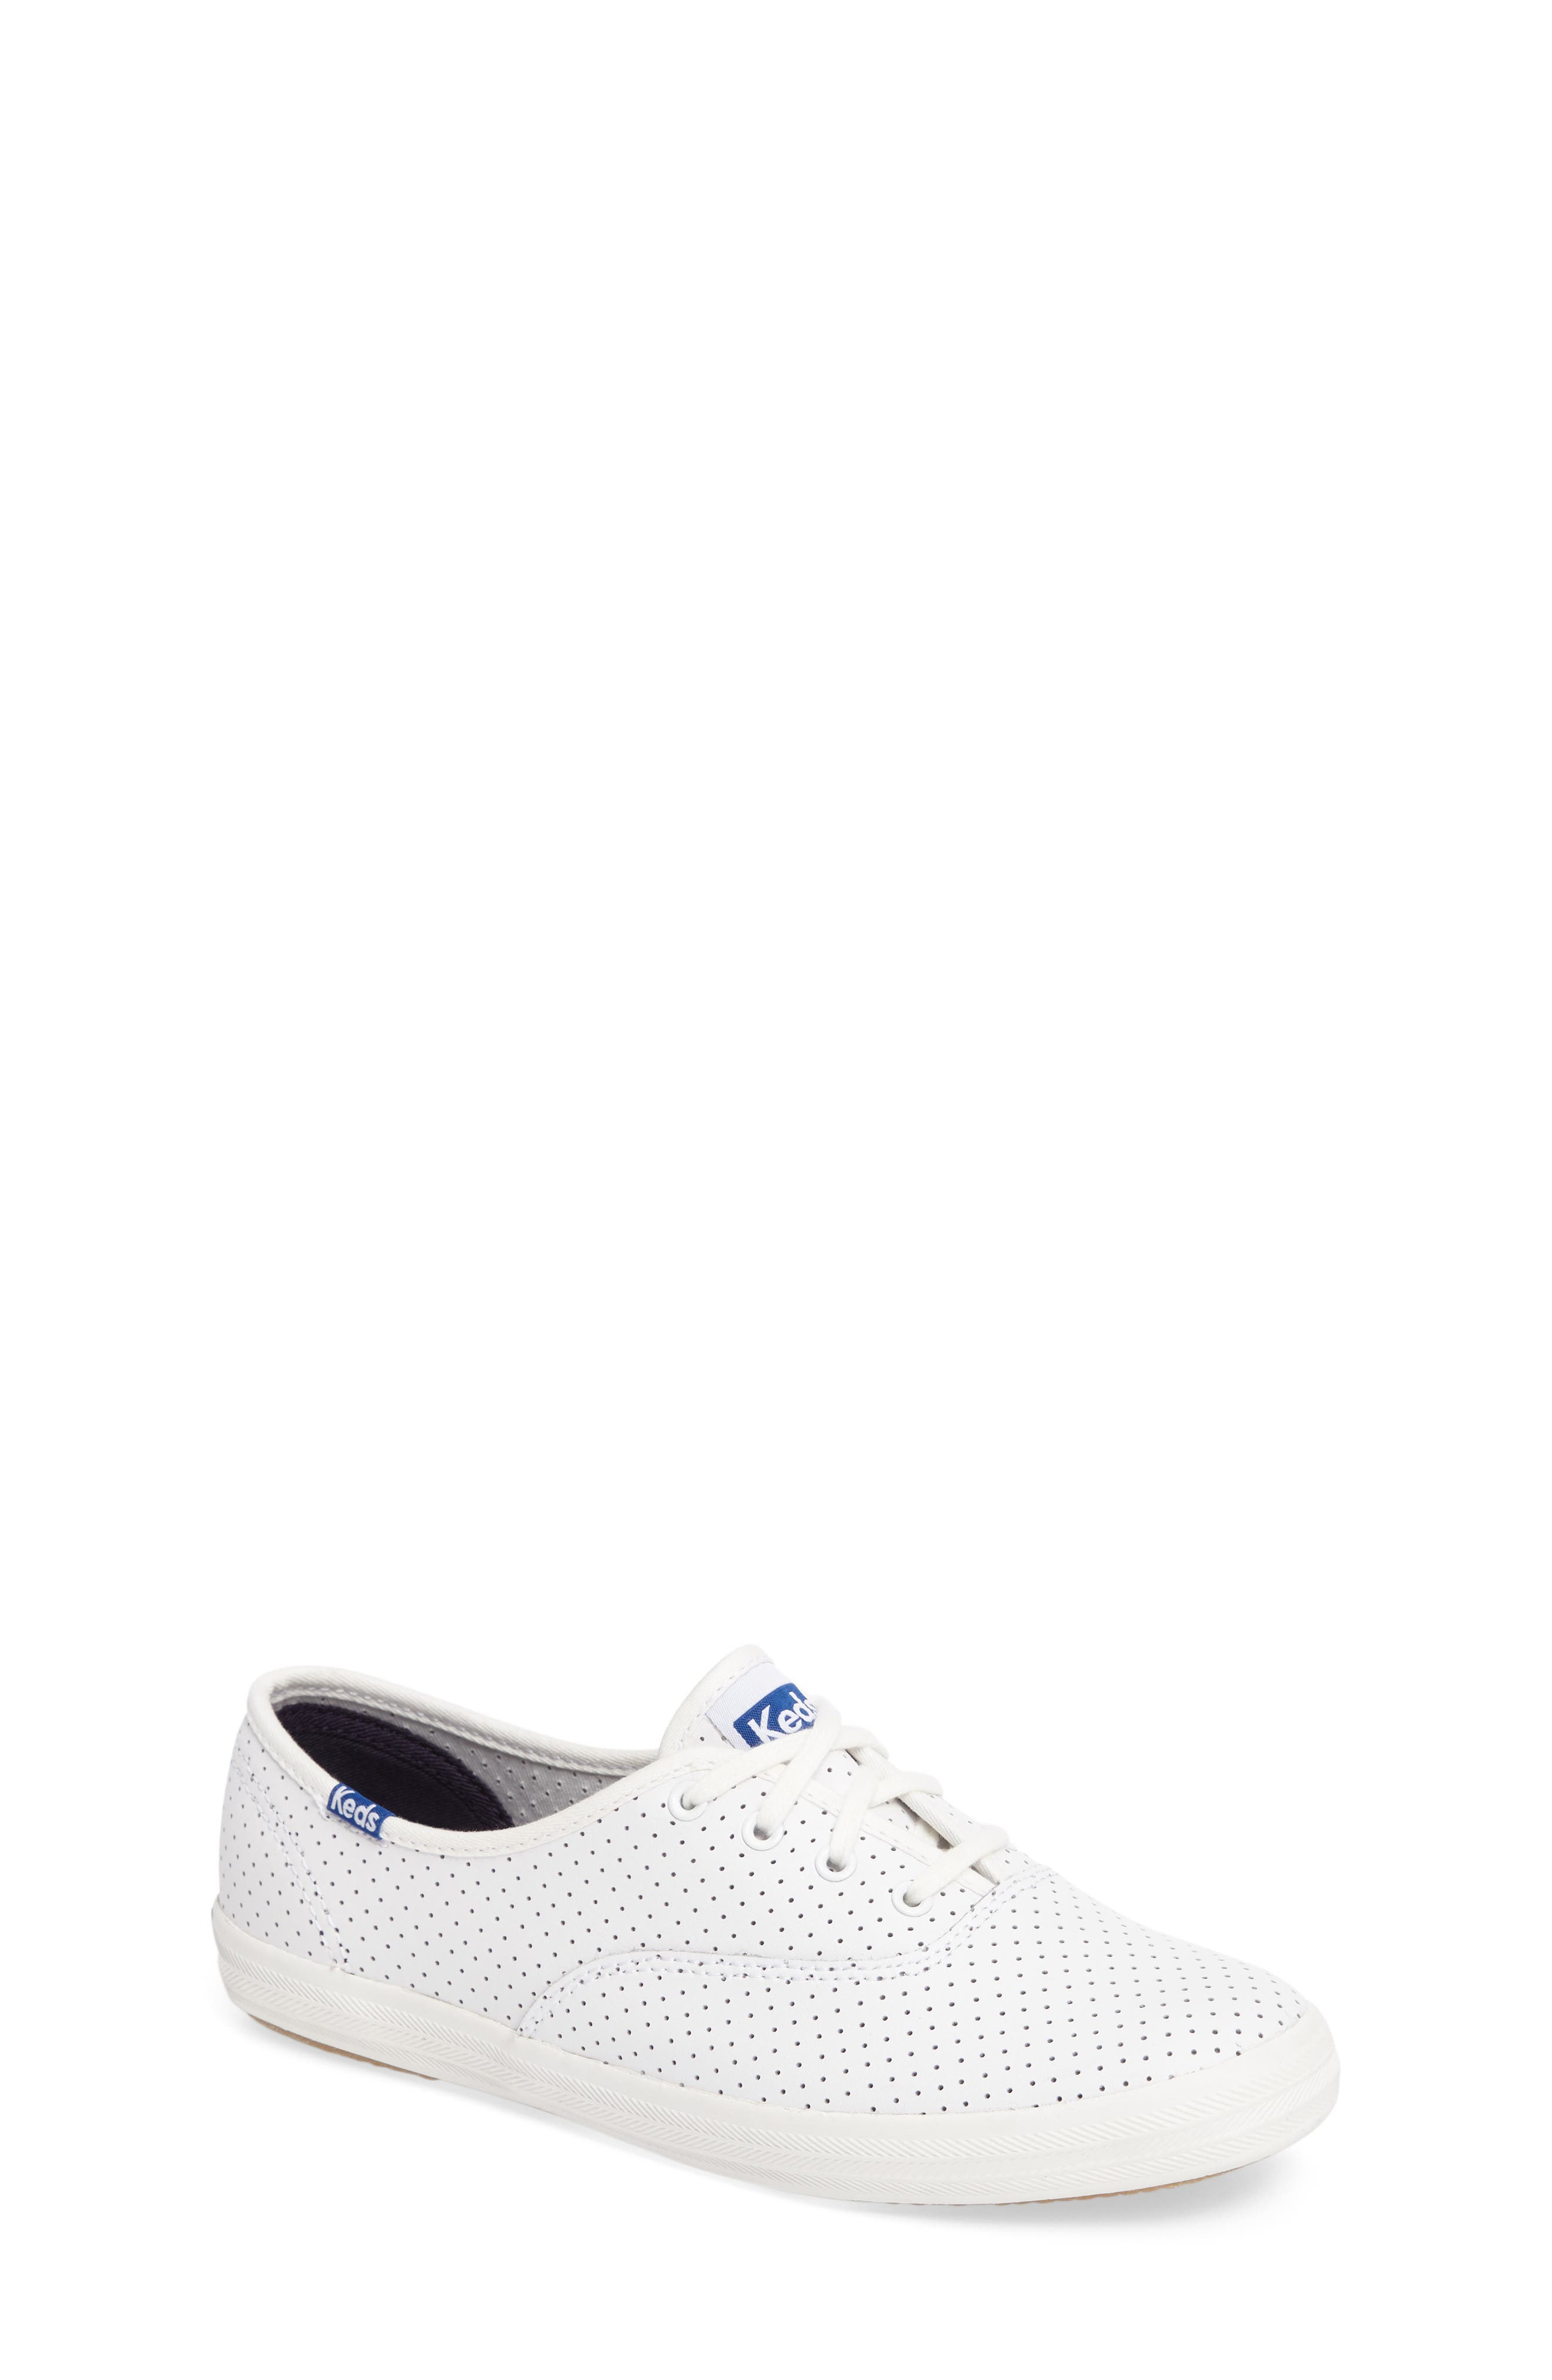 Main Image - Keds® Champion Perforated Sneaker (Women)